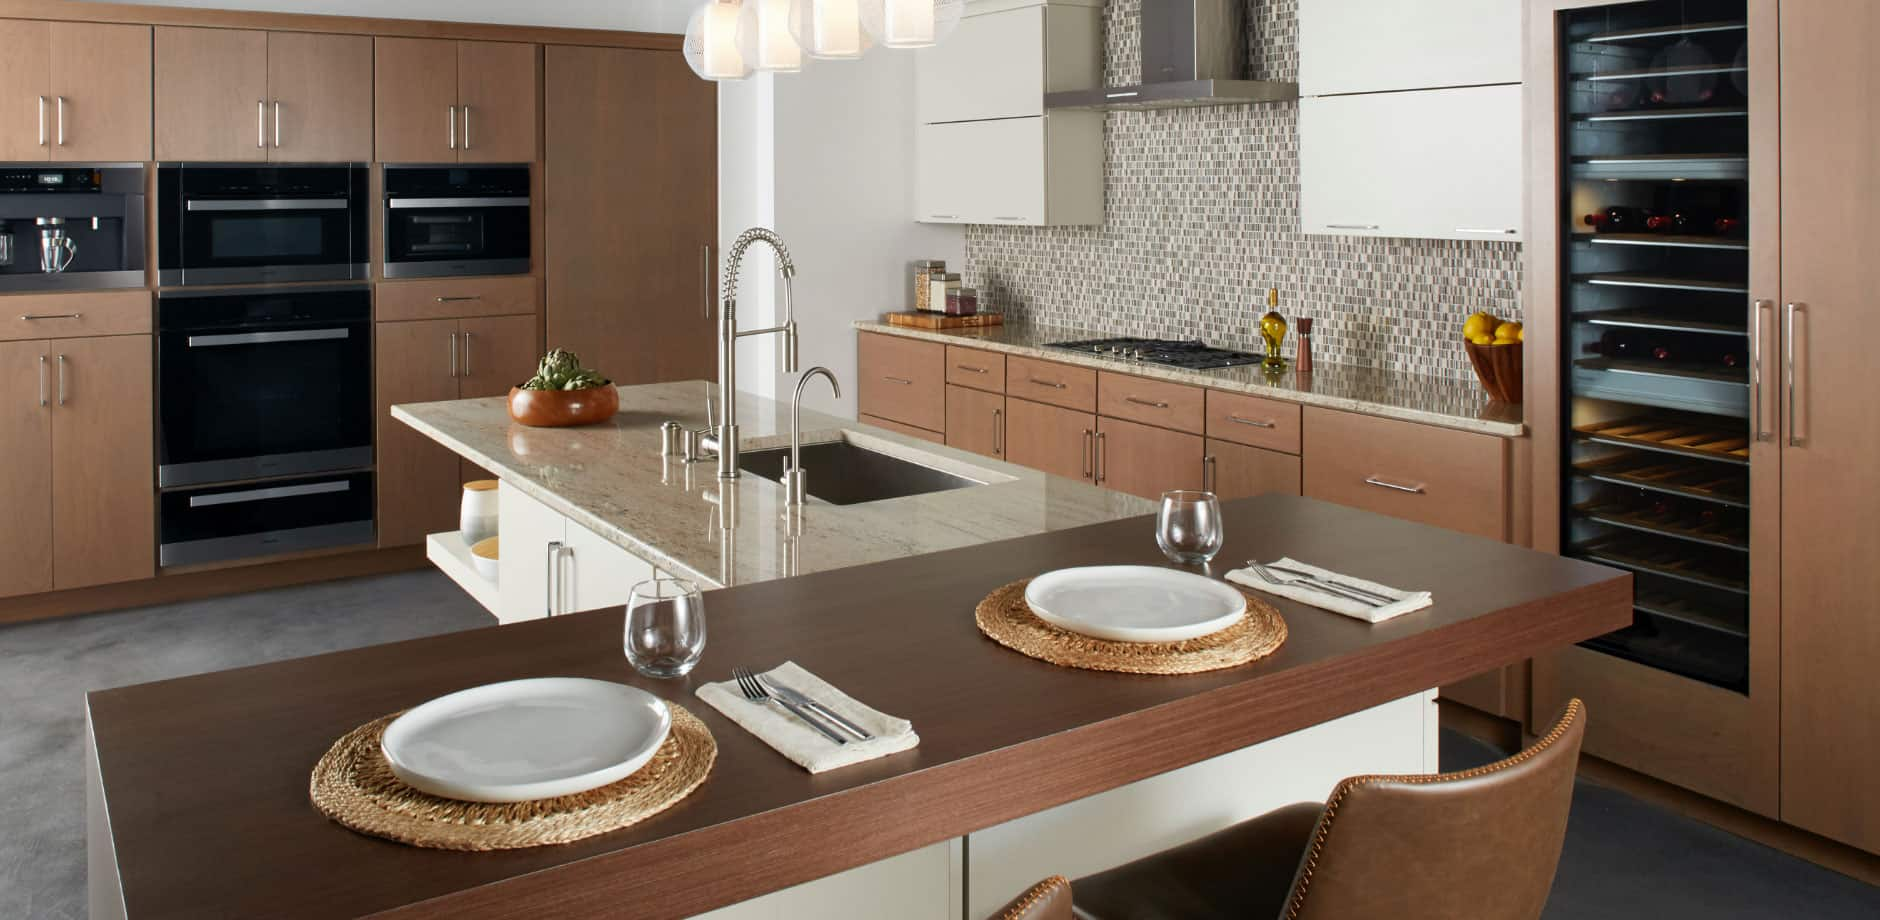 Kitchen Island Lifestyle